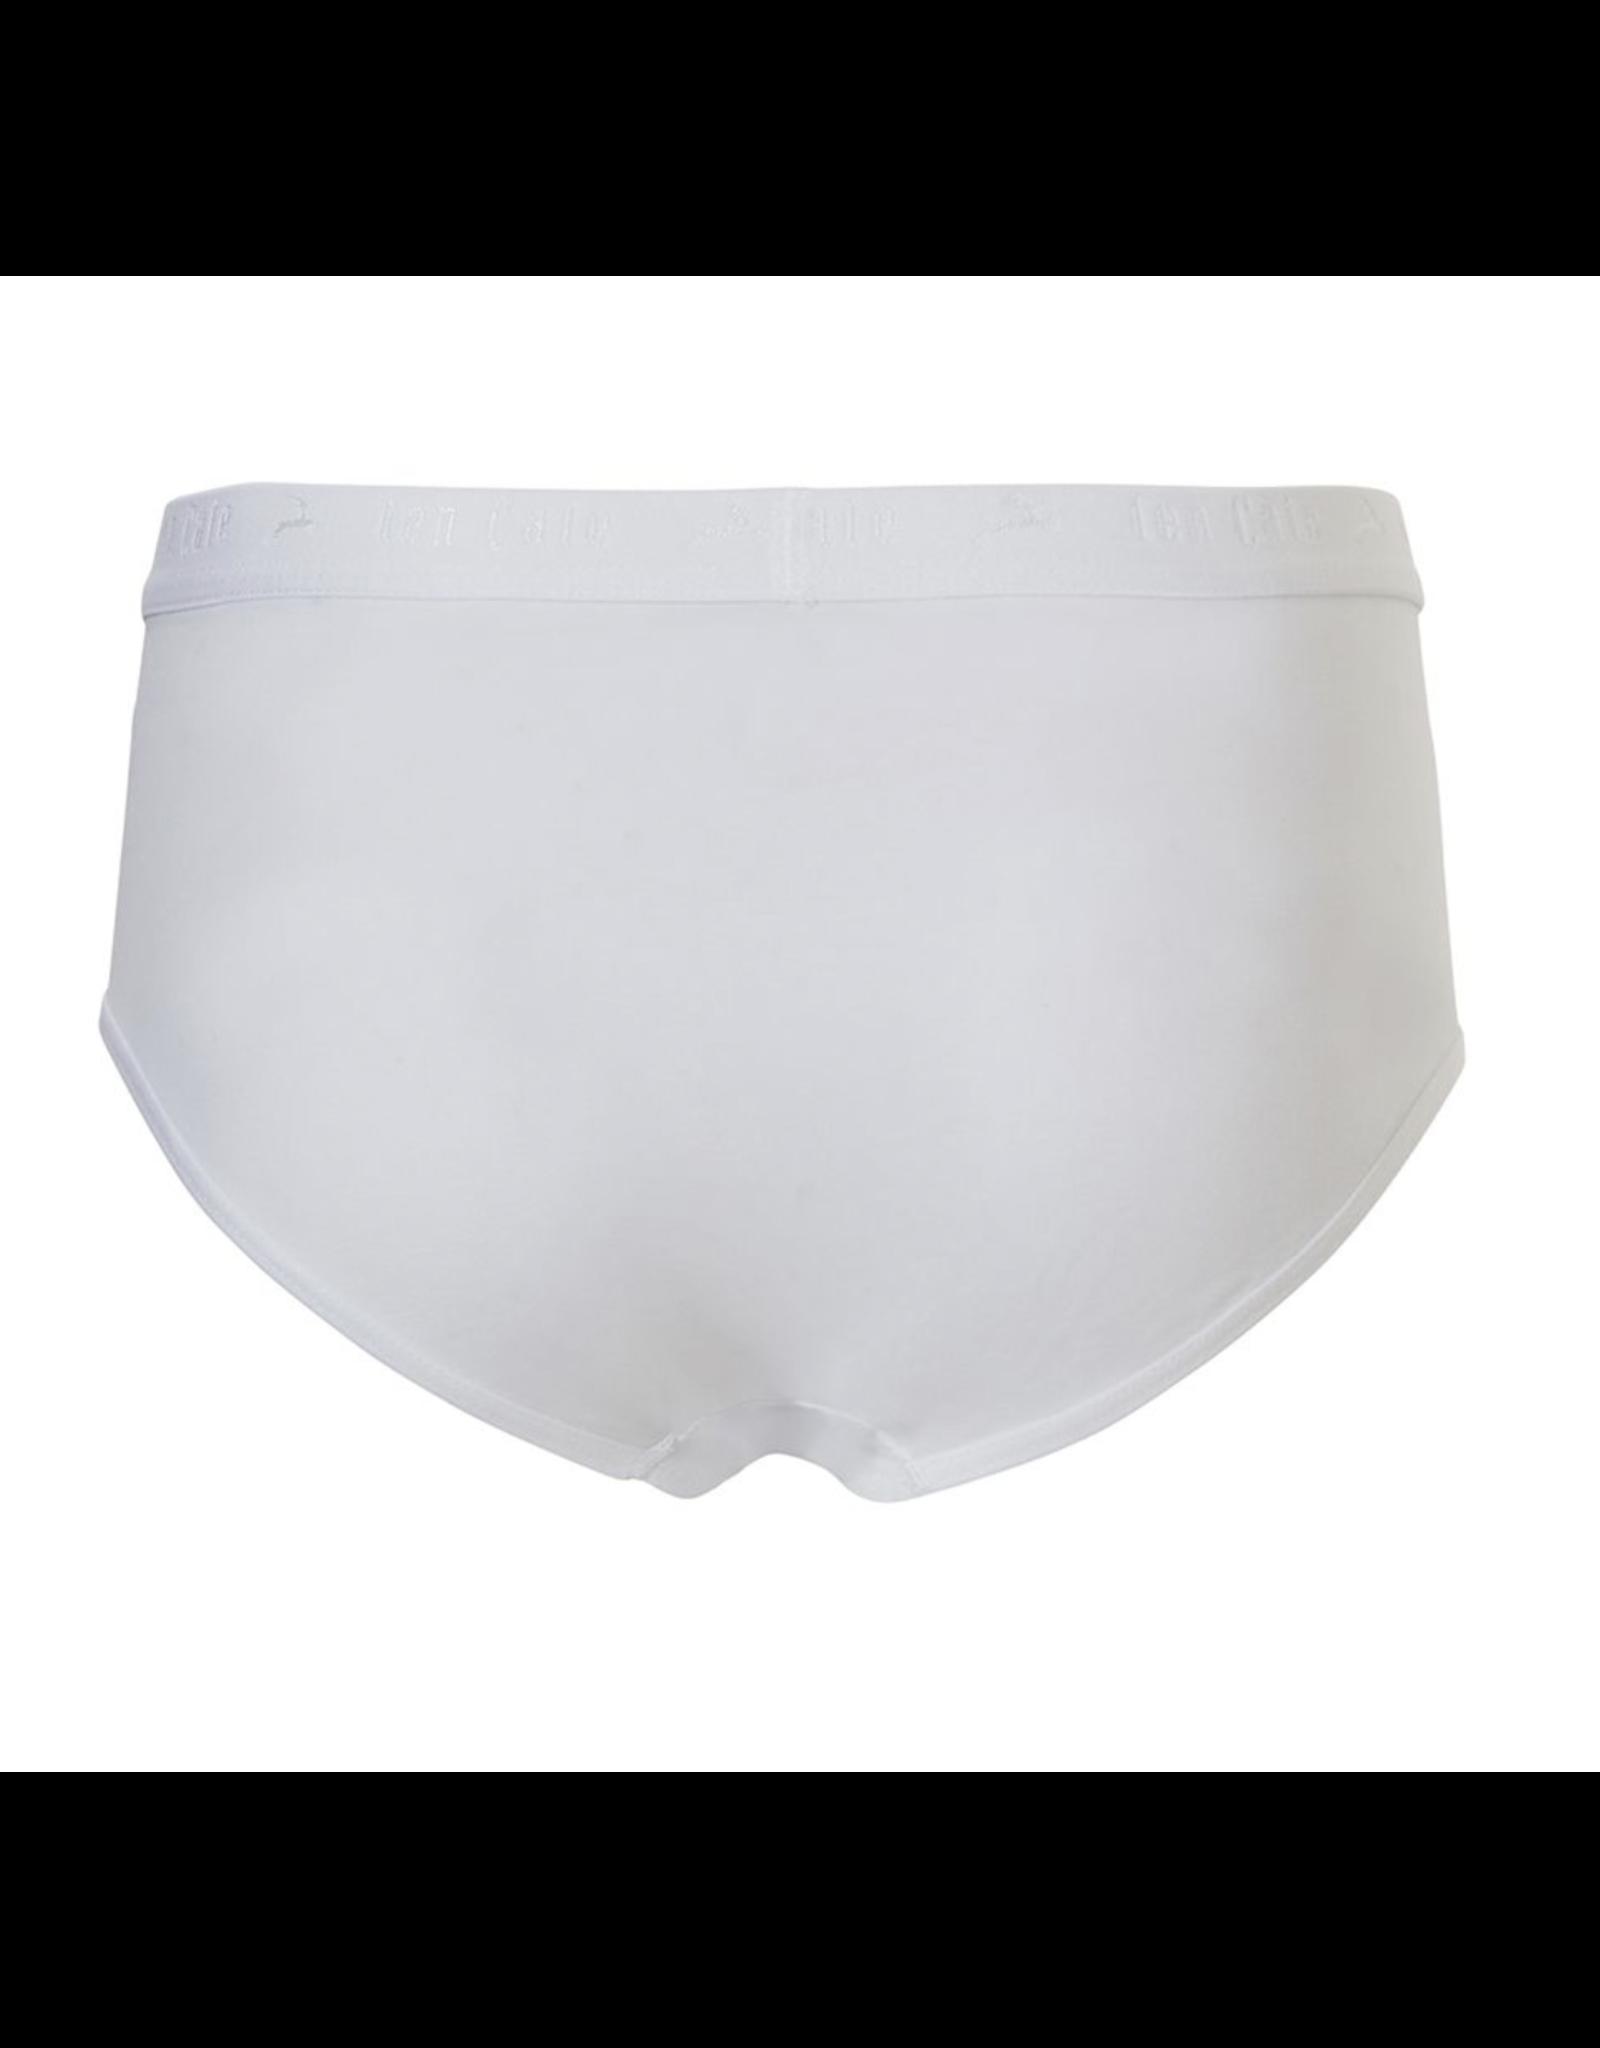 Ten Cate Basic Hipster 2x White